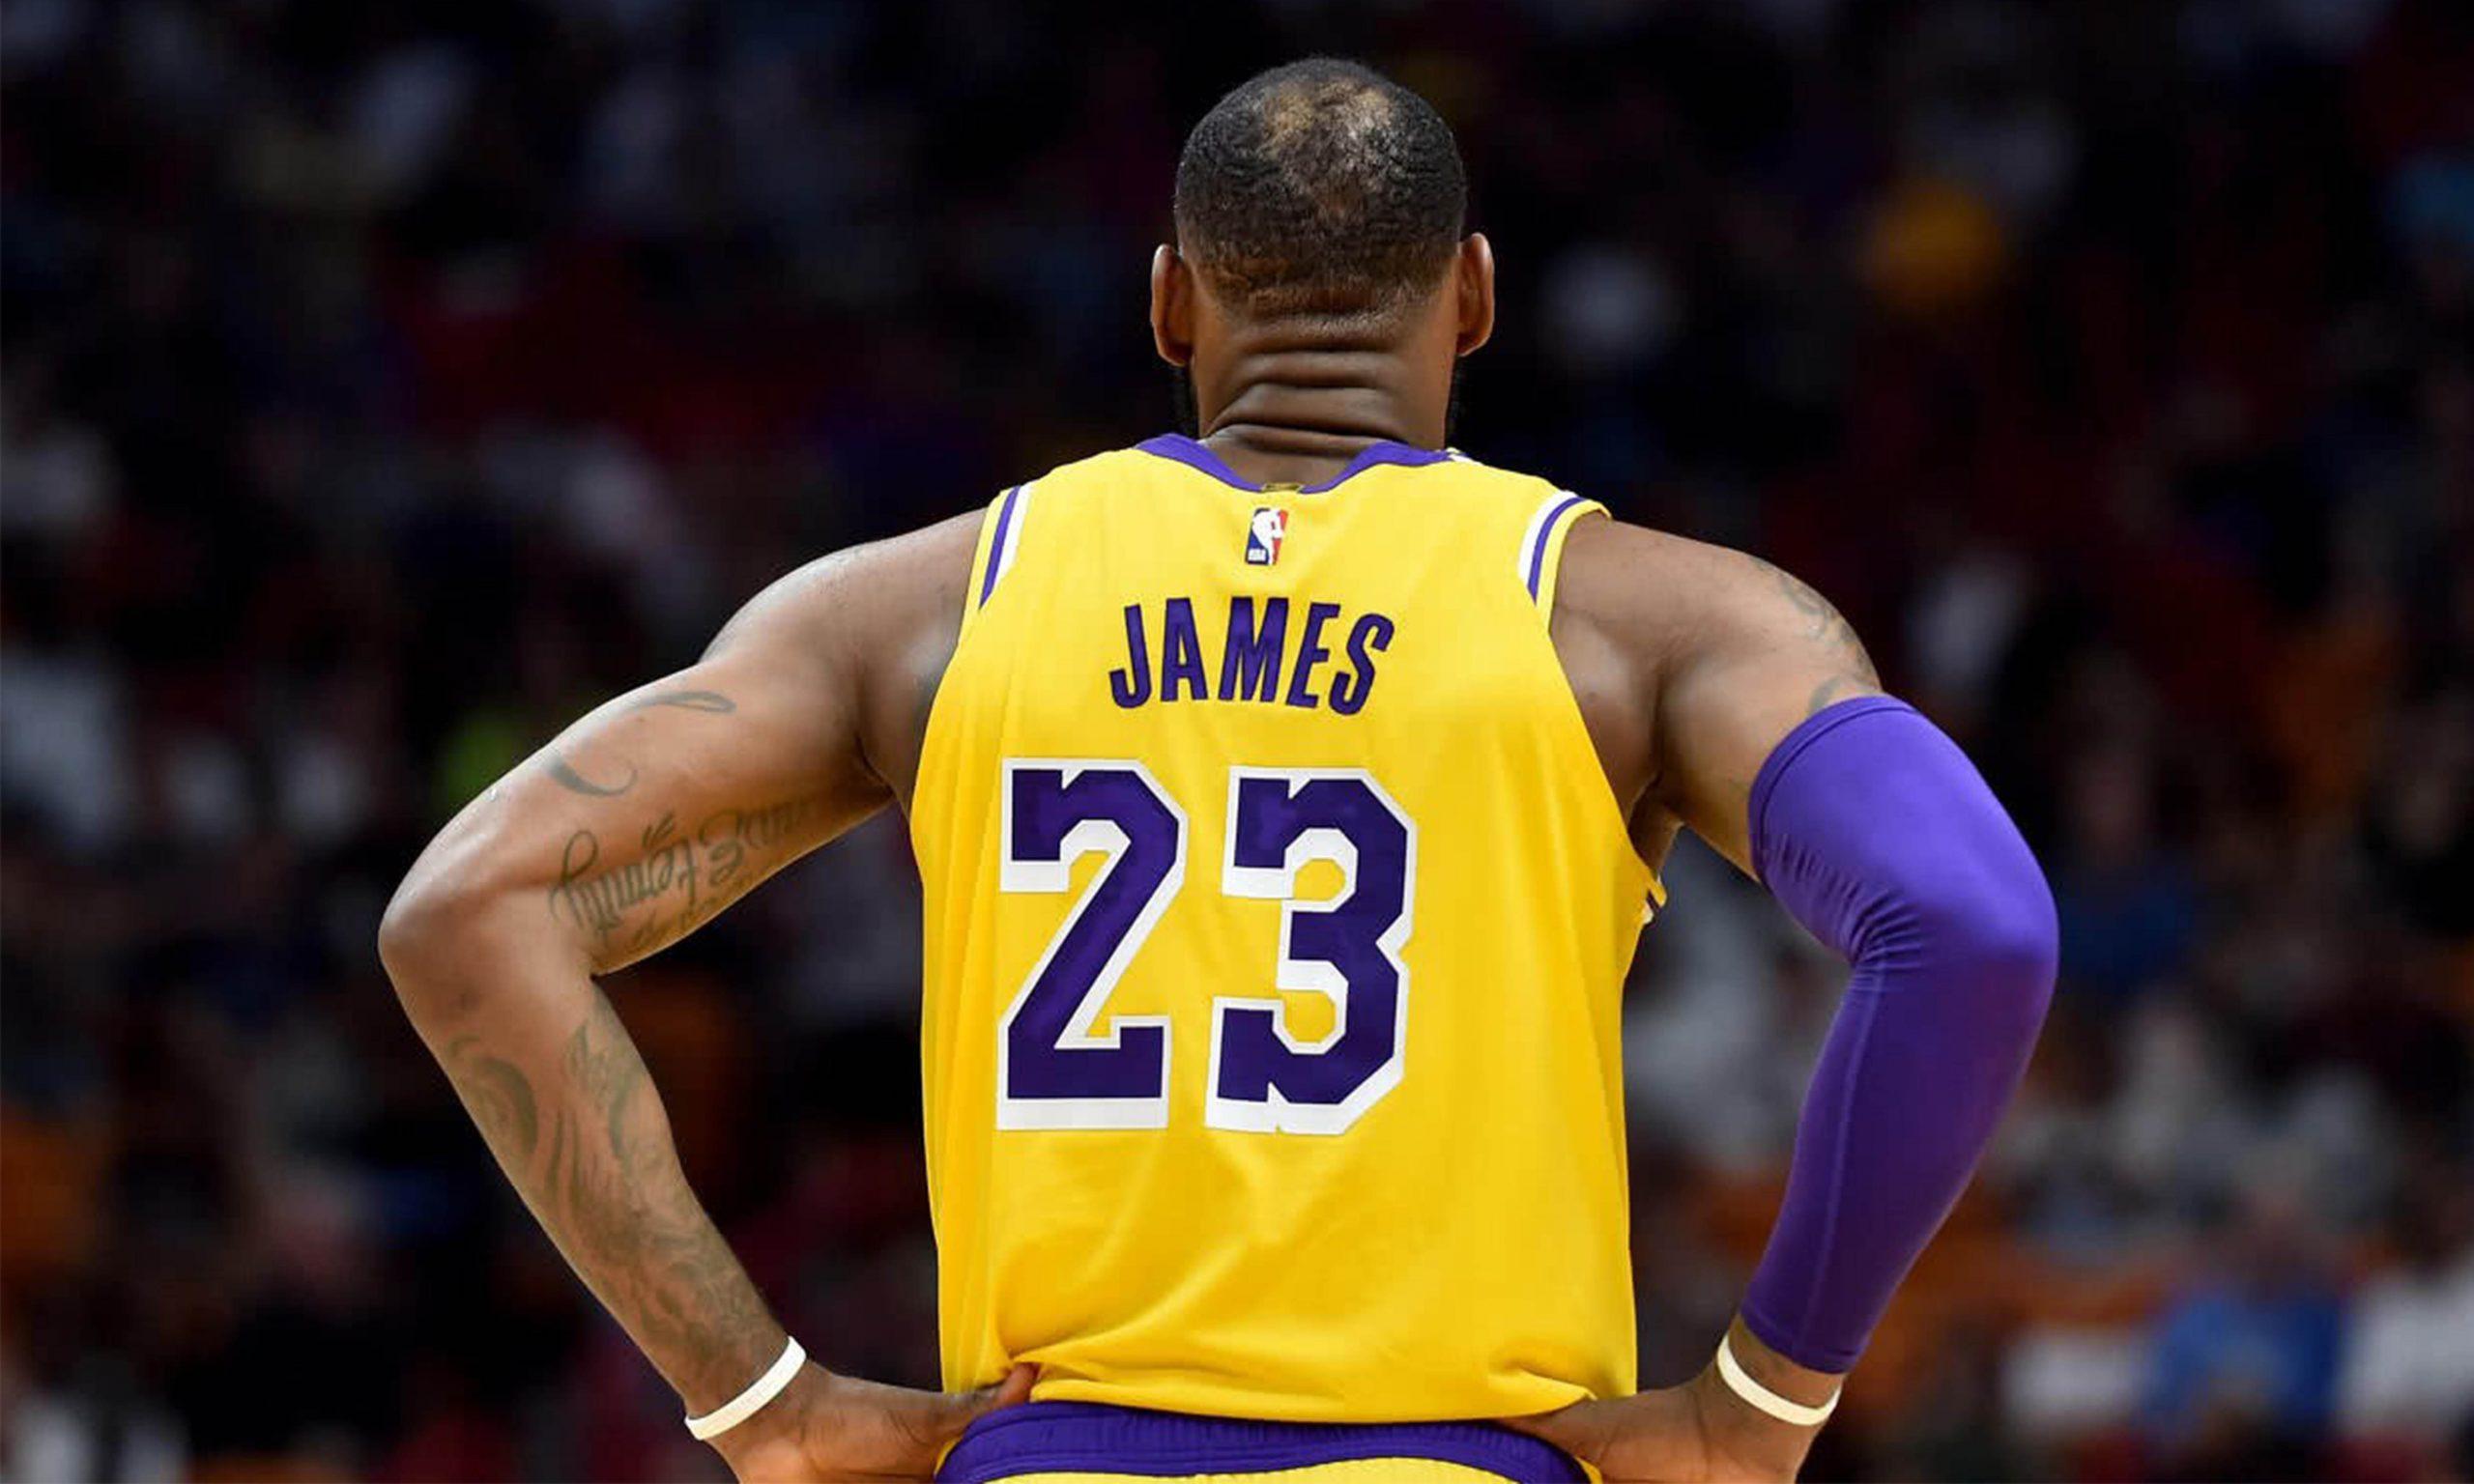 NBA 或将允许球员更改球衣名字